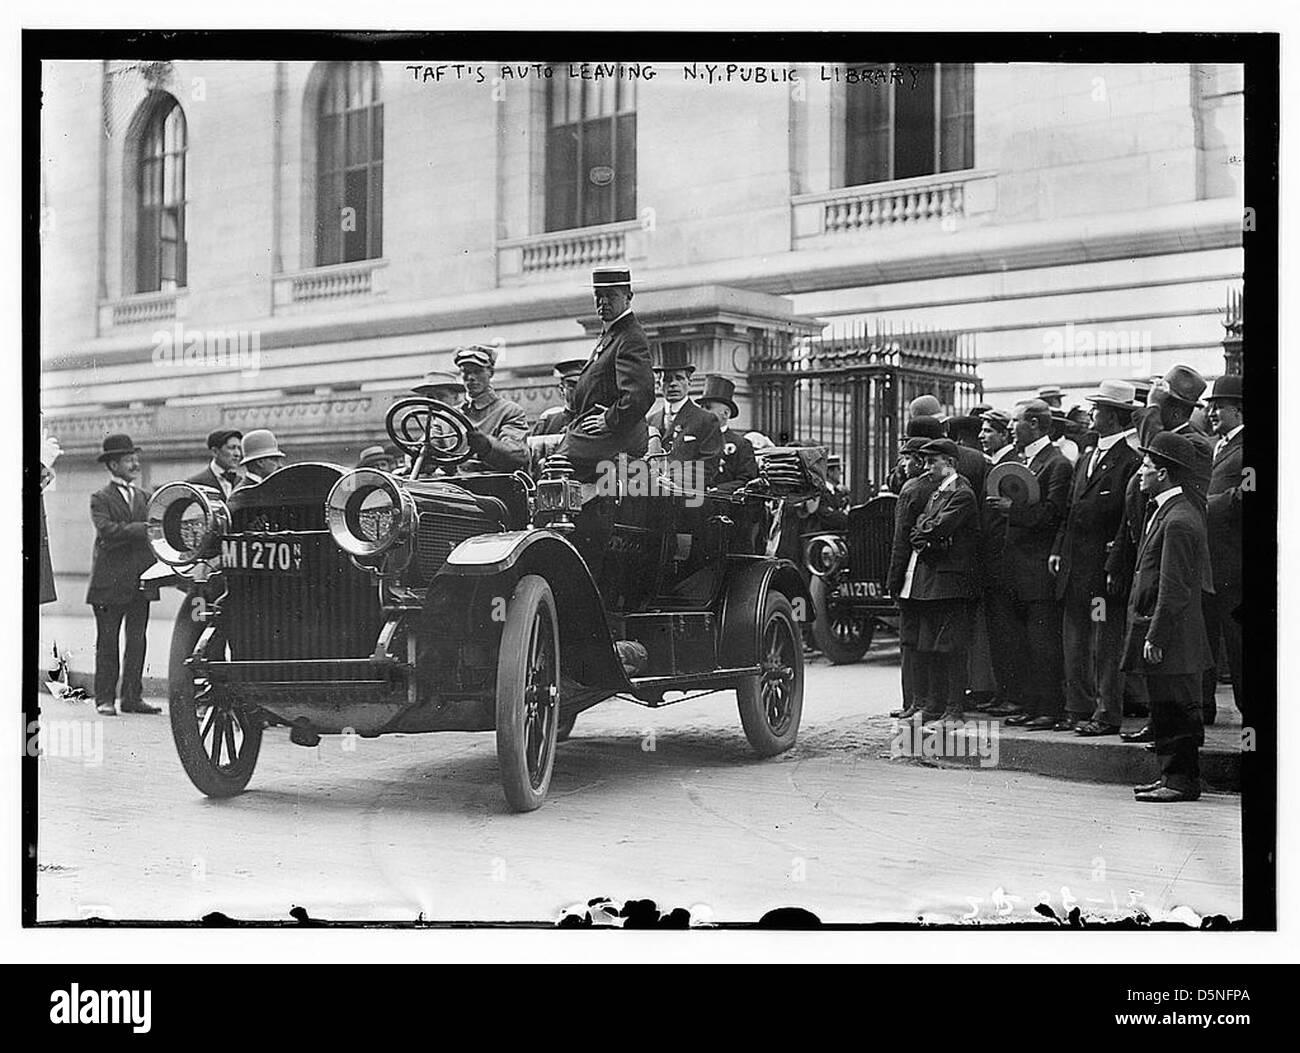 Taft's Auto leaving N.Y. Public Library (LOC) - Stock Image